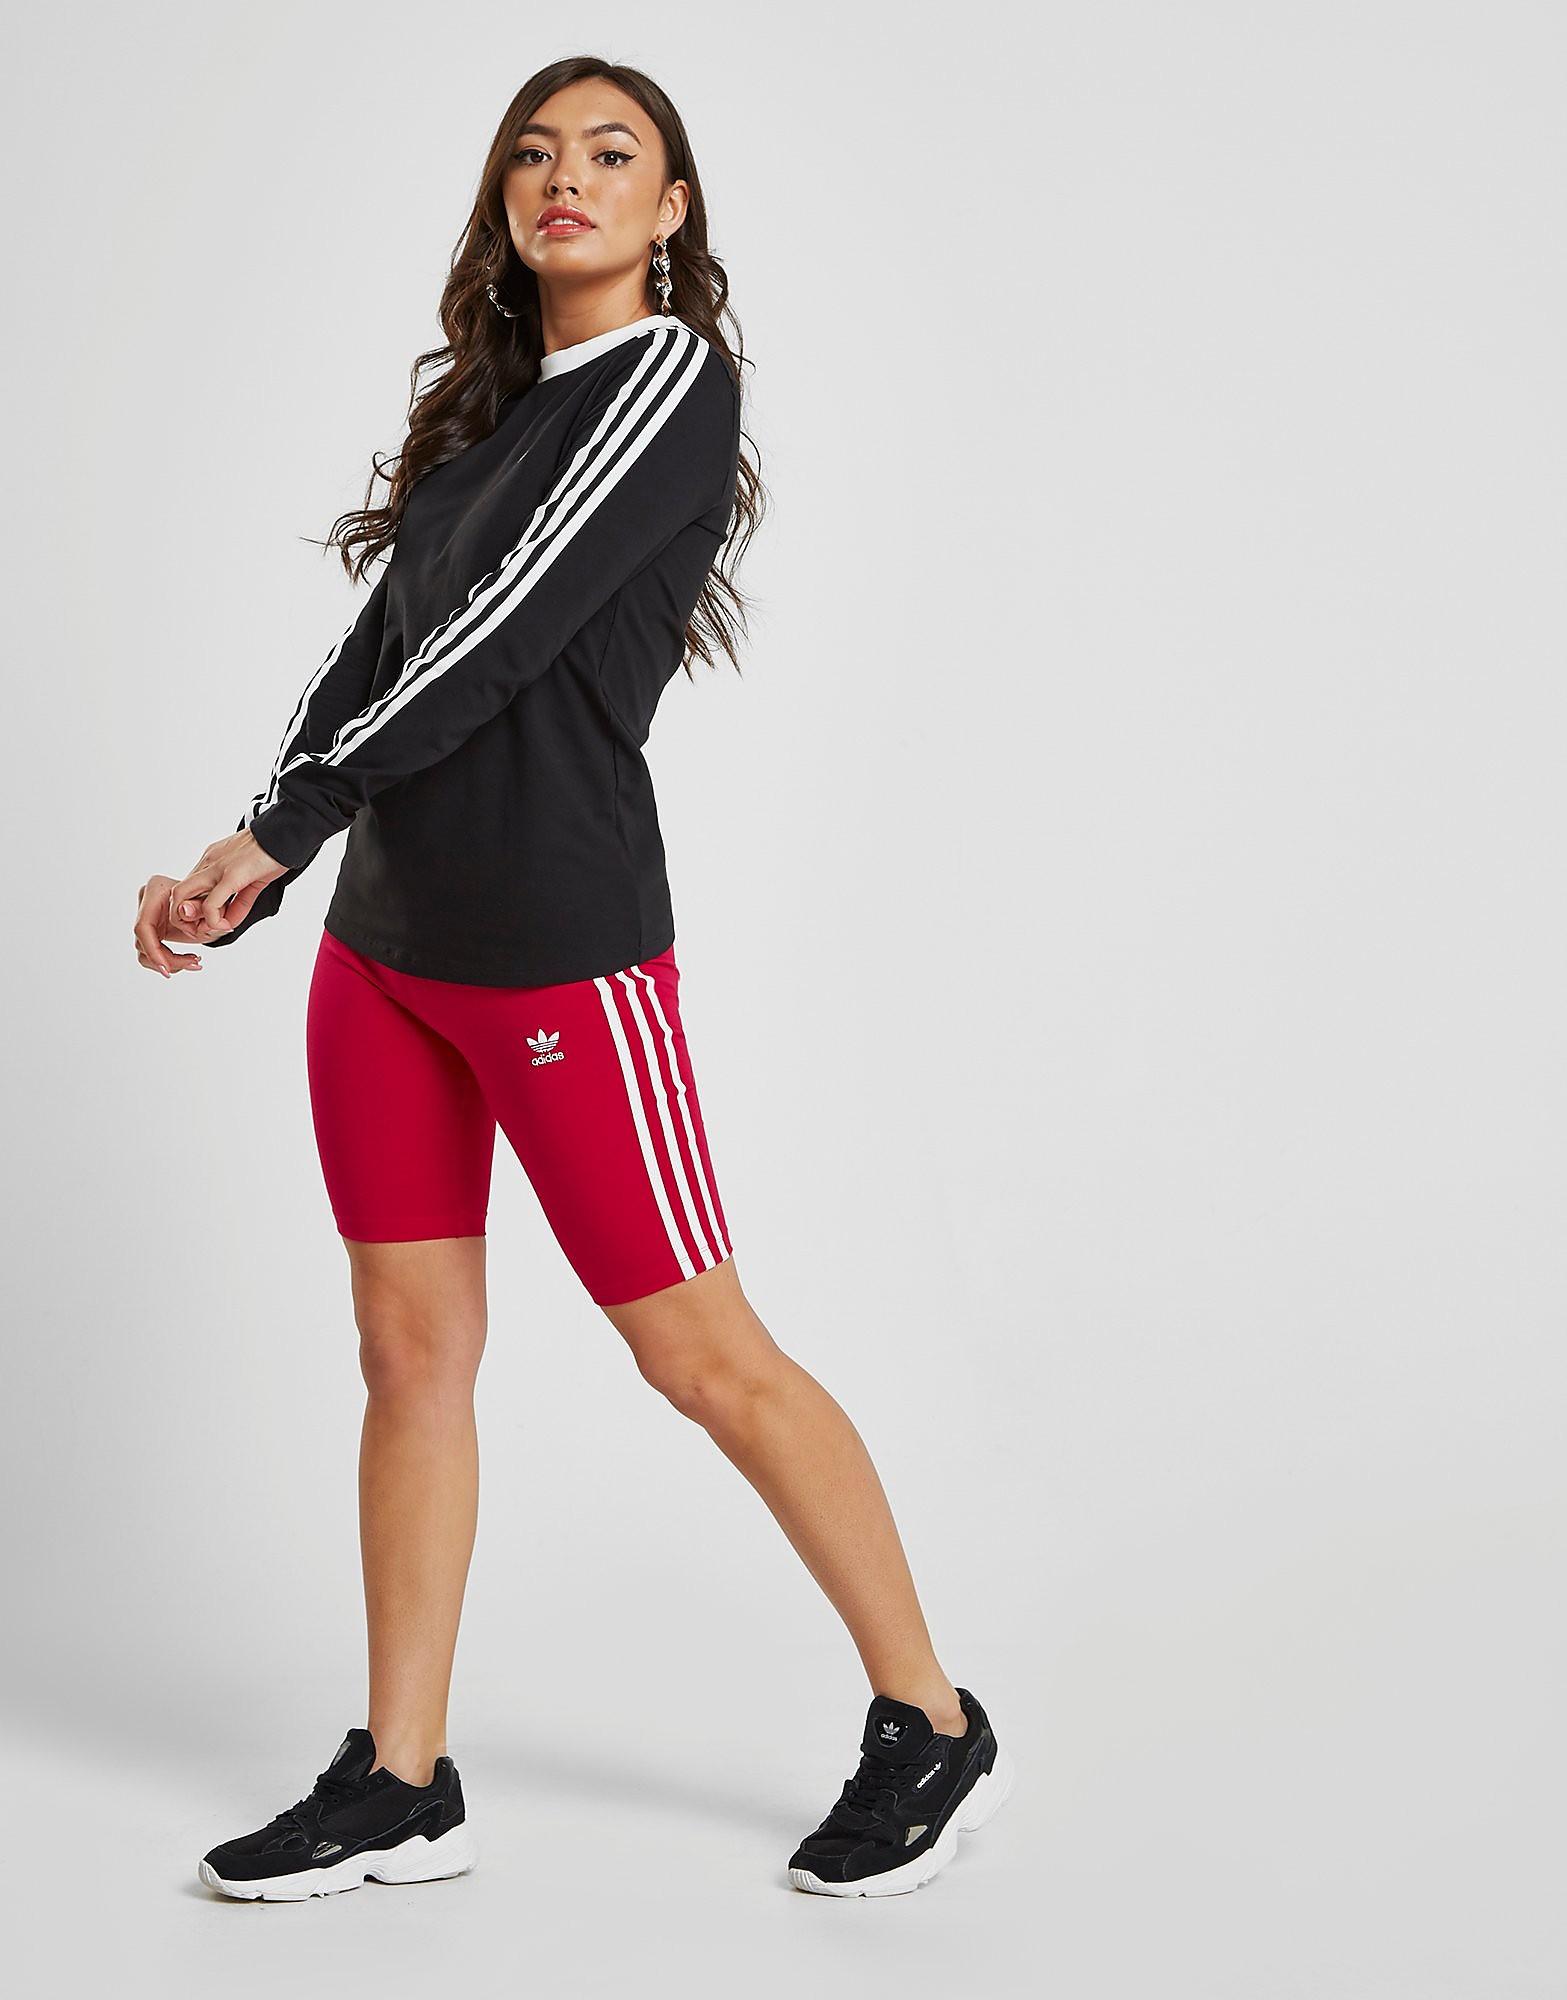 Adidas Originals Tops Women Jd Sports